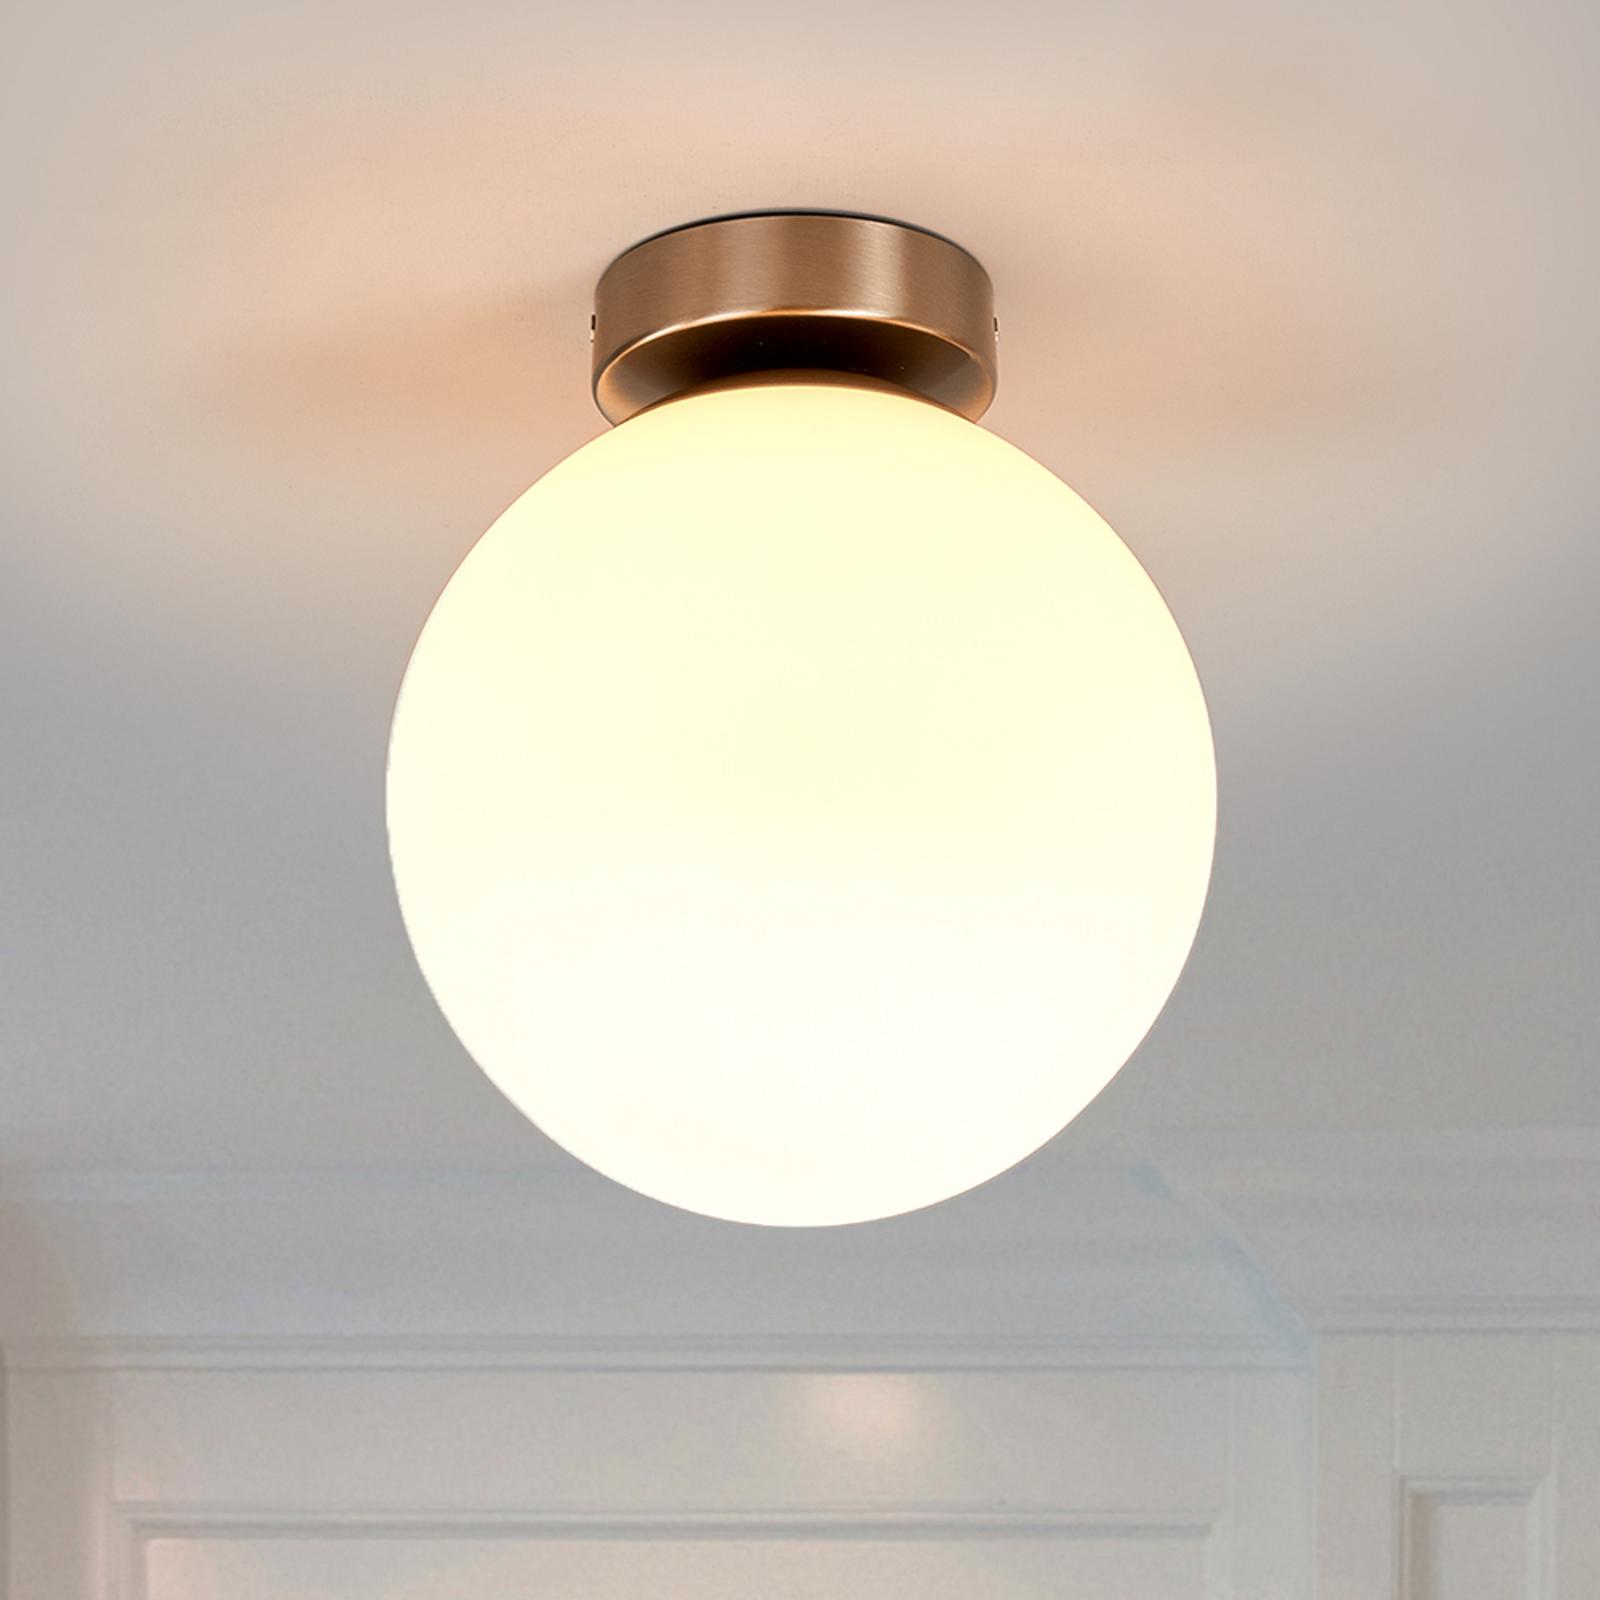 Round Bathroom Ceiling Light Lennie Lights Co Uk